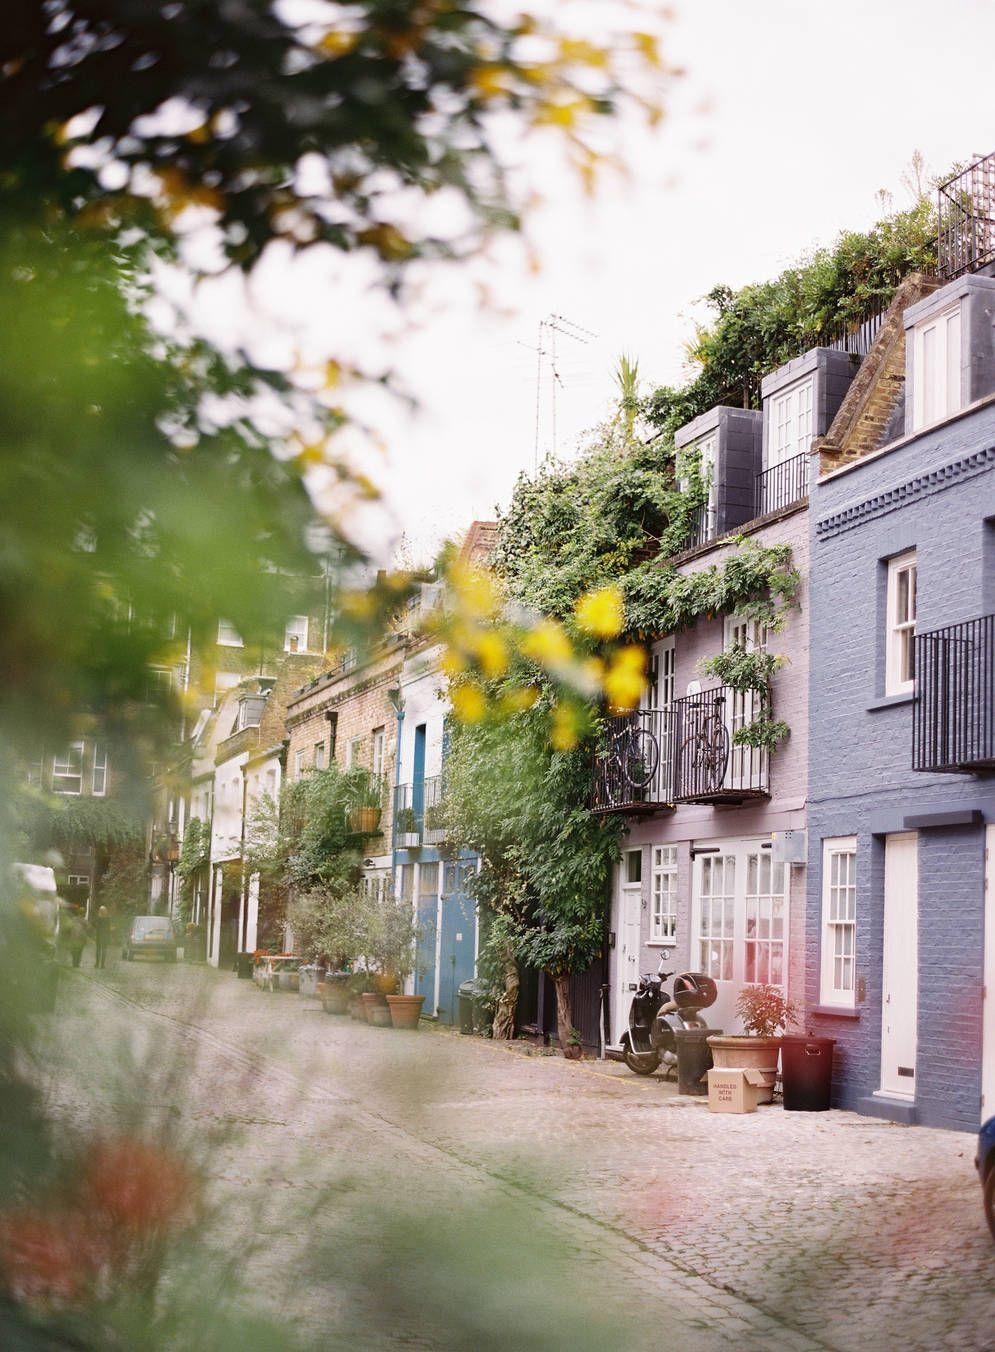 Notting Hill London: Notting Hill, London Guide